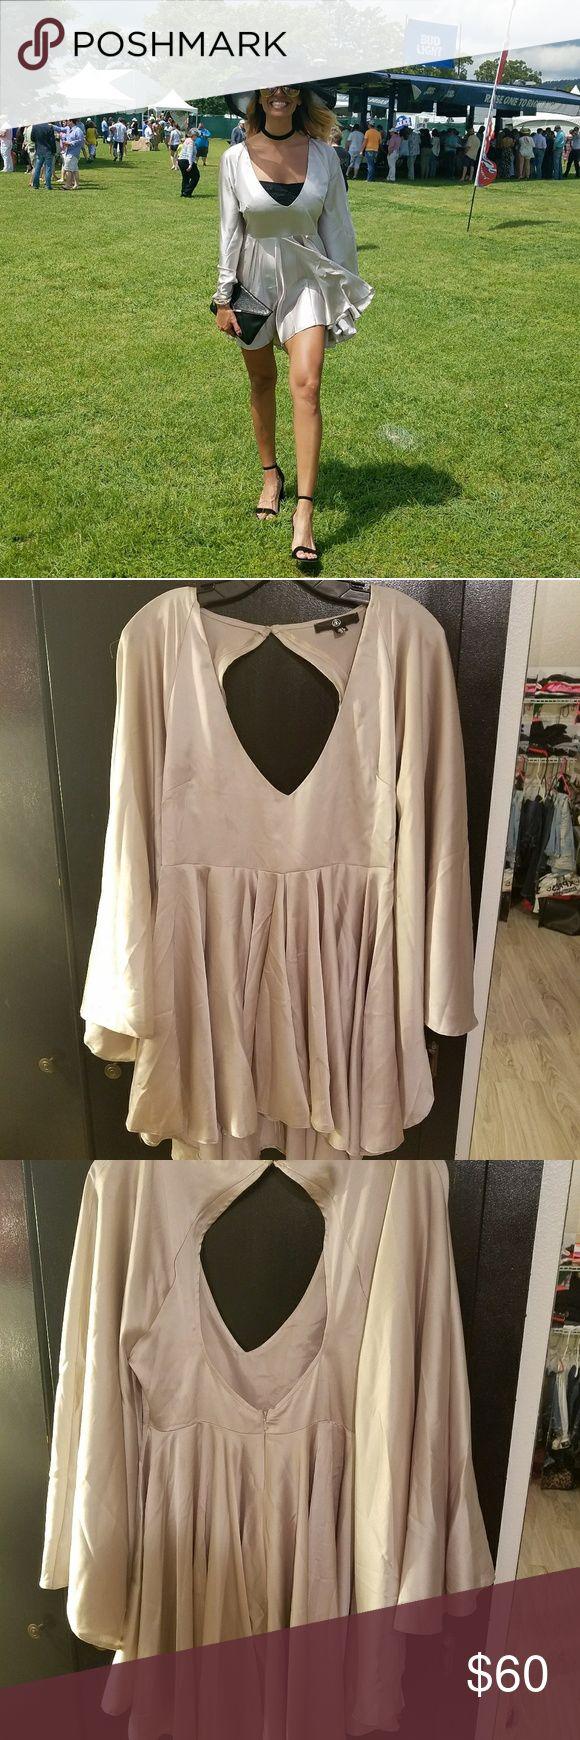 Elegant open back dress Slinky open back swing dress. Worn once. US 4, UK 8 Missguided Dresses High Low